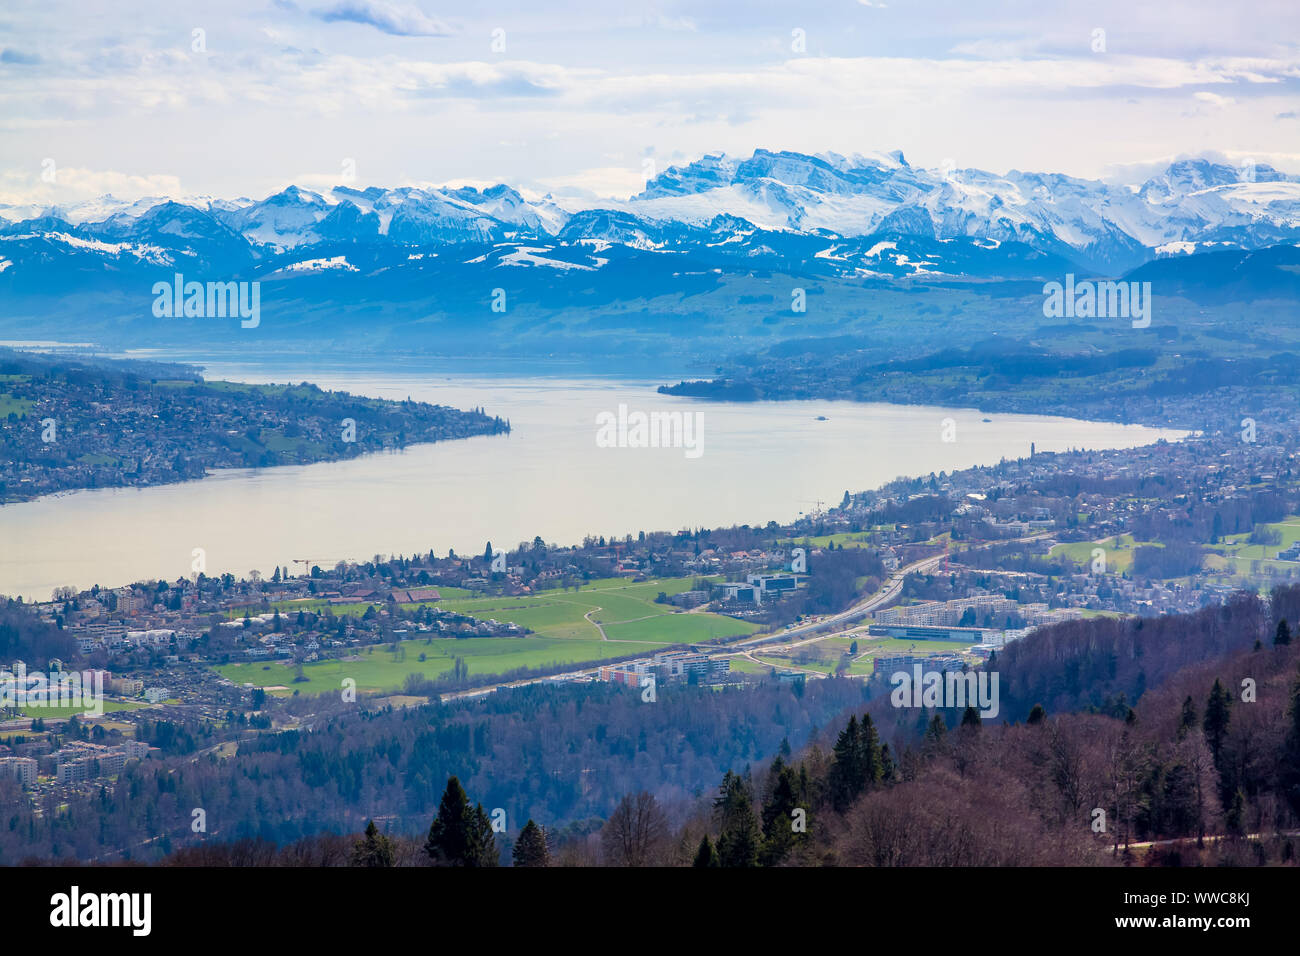 Panorama of Zurich city and lake from Uetliberg mountain in Switzerland Stock Photo